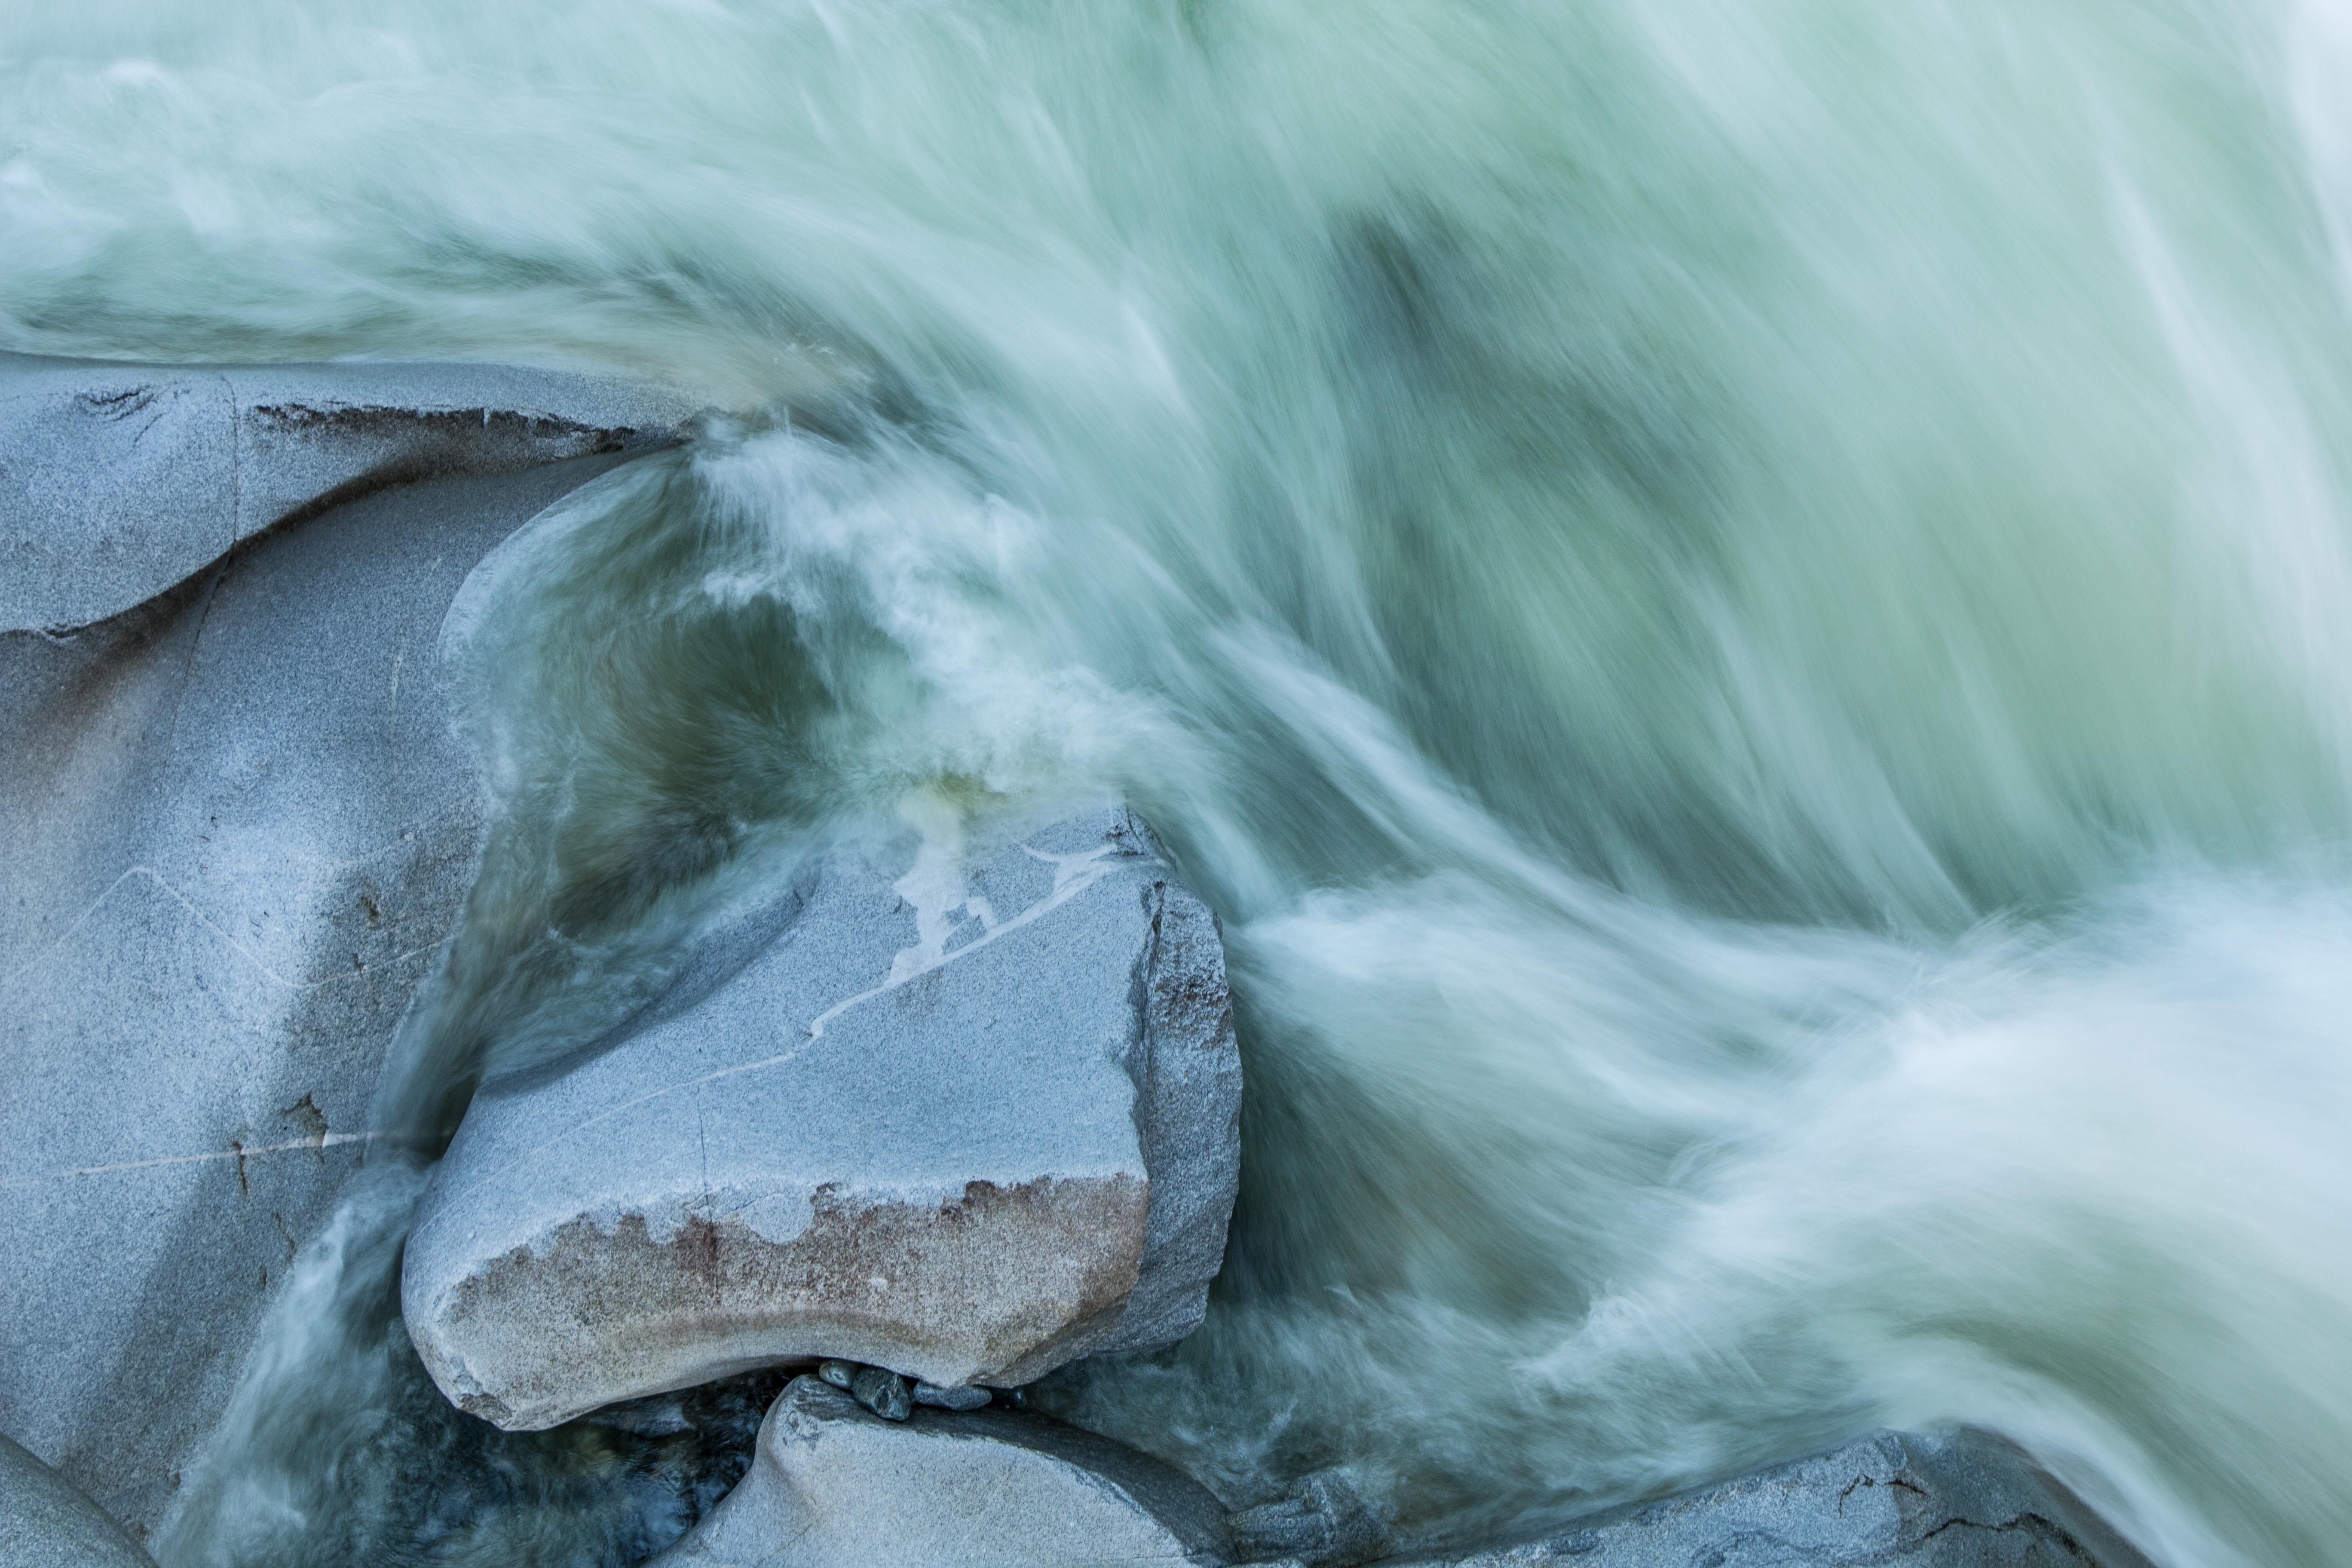 Swirling sea waves foaming against smooth rocks